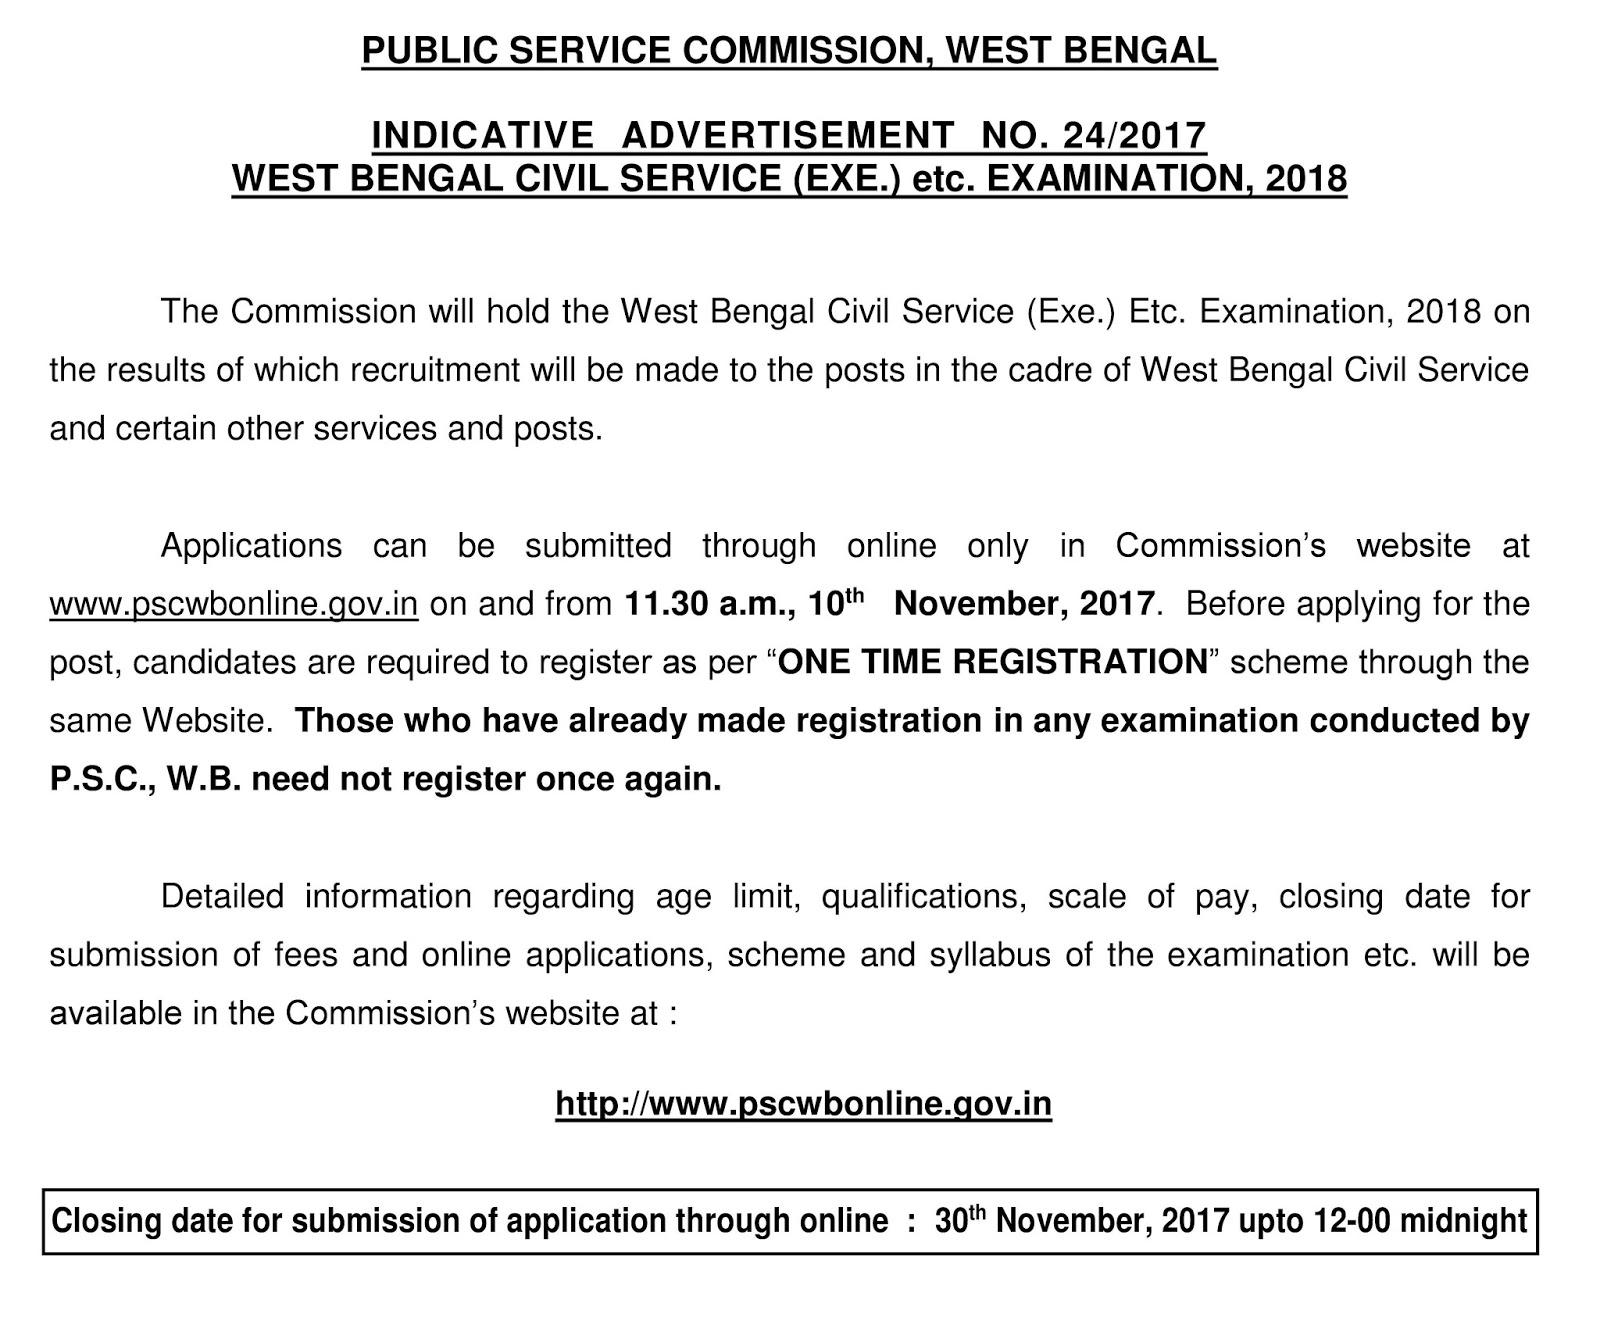 24/2017 WEST BENGAL CIVIL SERVICE (EXE.) etc. EXAMINATION, 2018